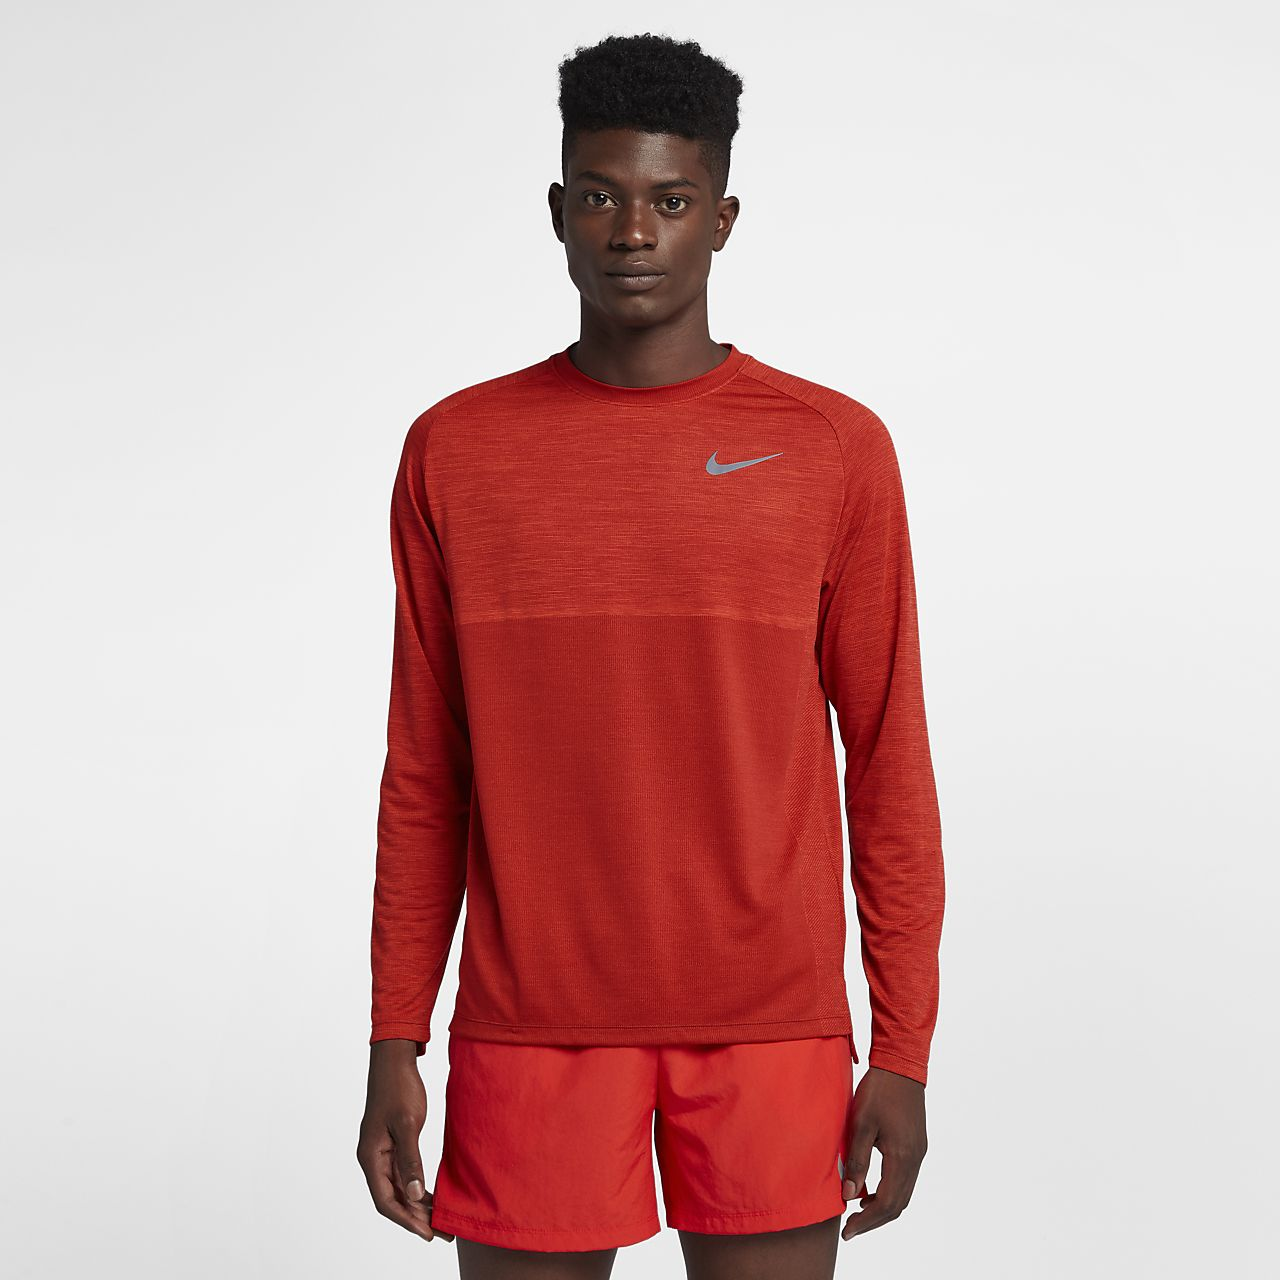 36ff0c75 Nike Dri-FIT Medalist Men's Long-Sleeve Running Top. Nike.com GB